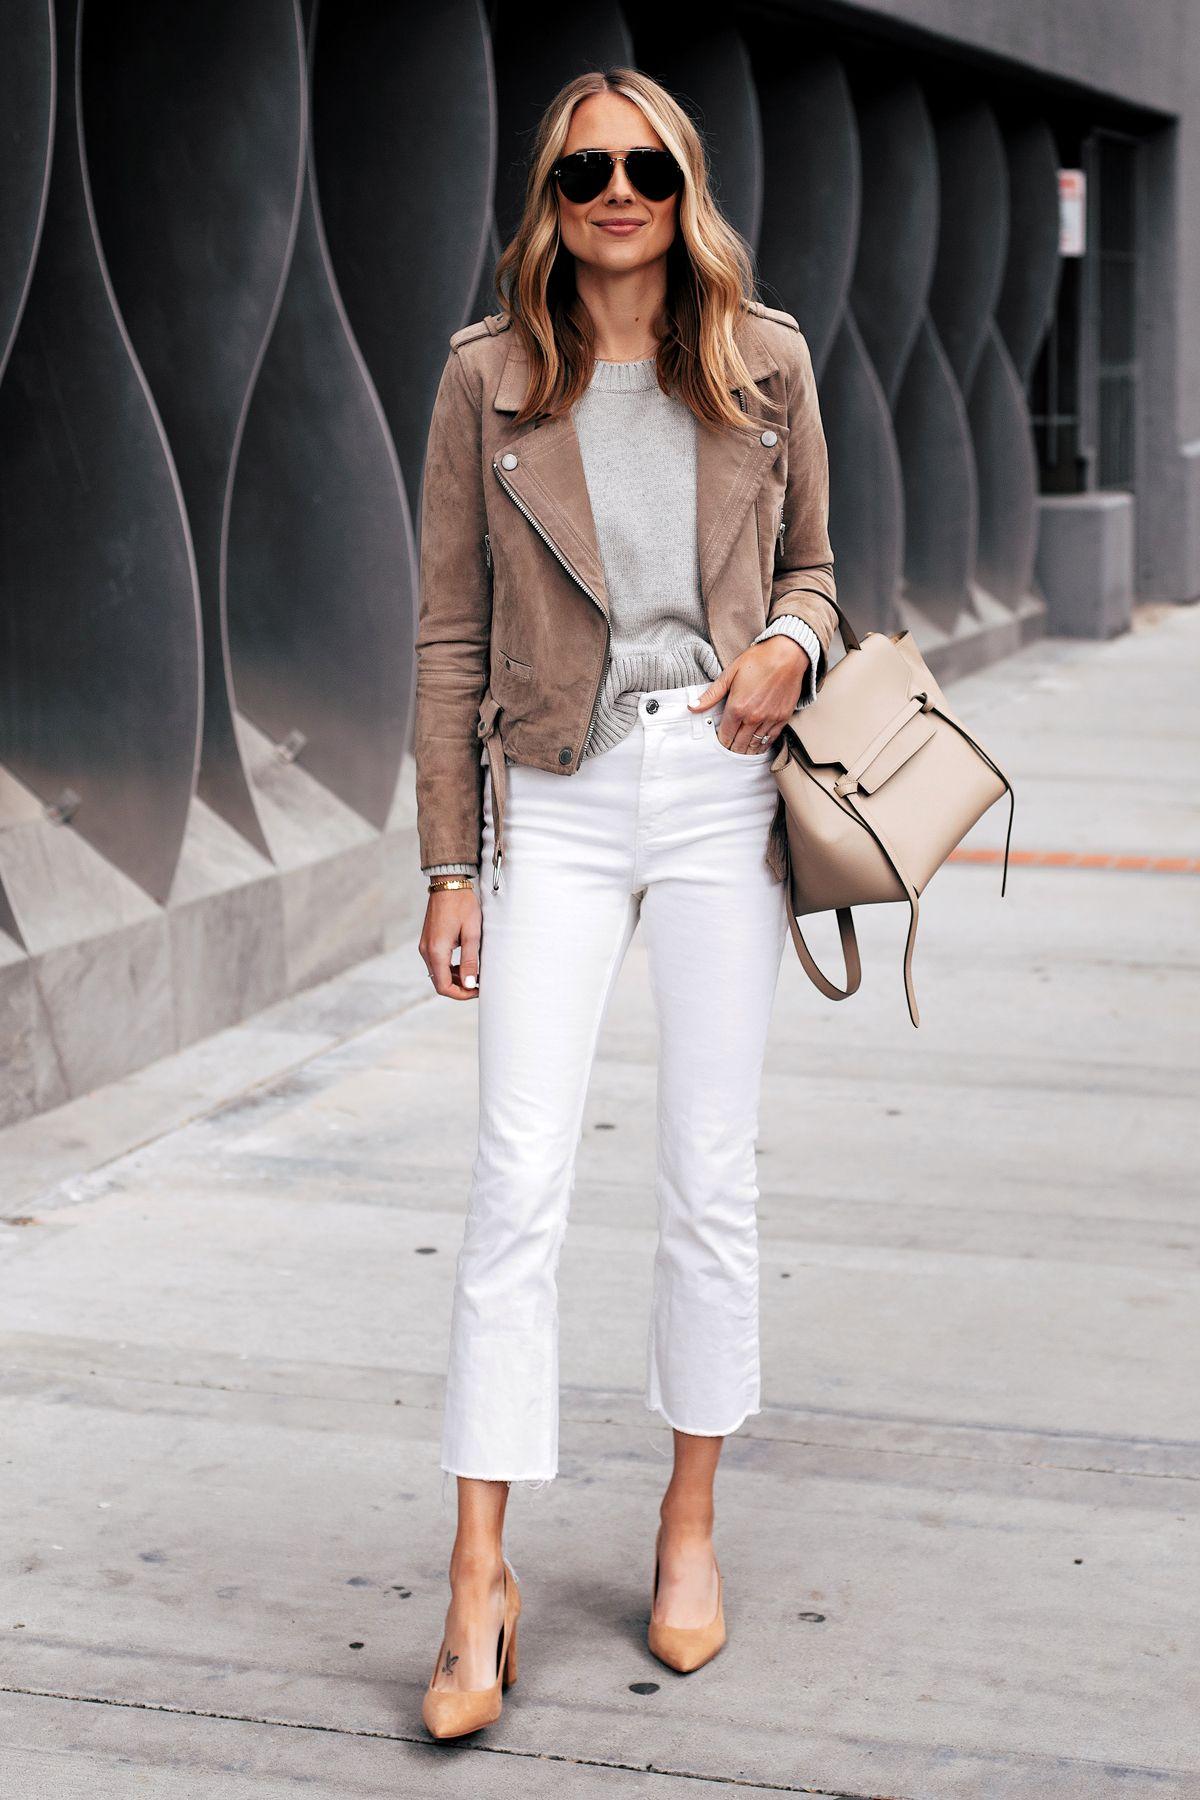 How To Wear White Jeans In Winter | Poor Little It Girl